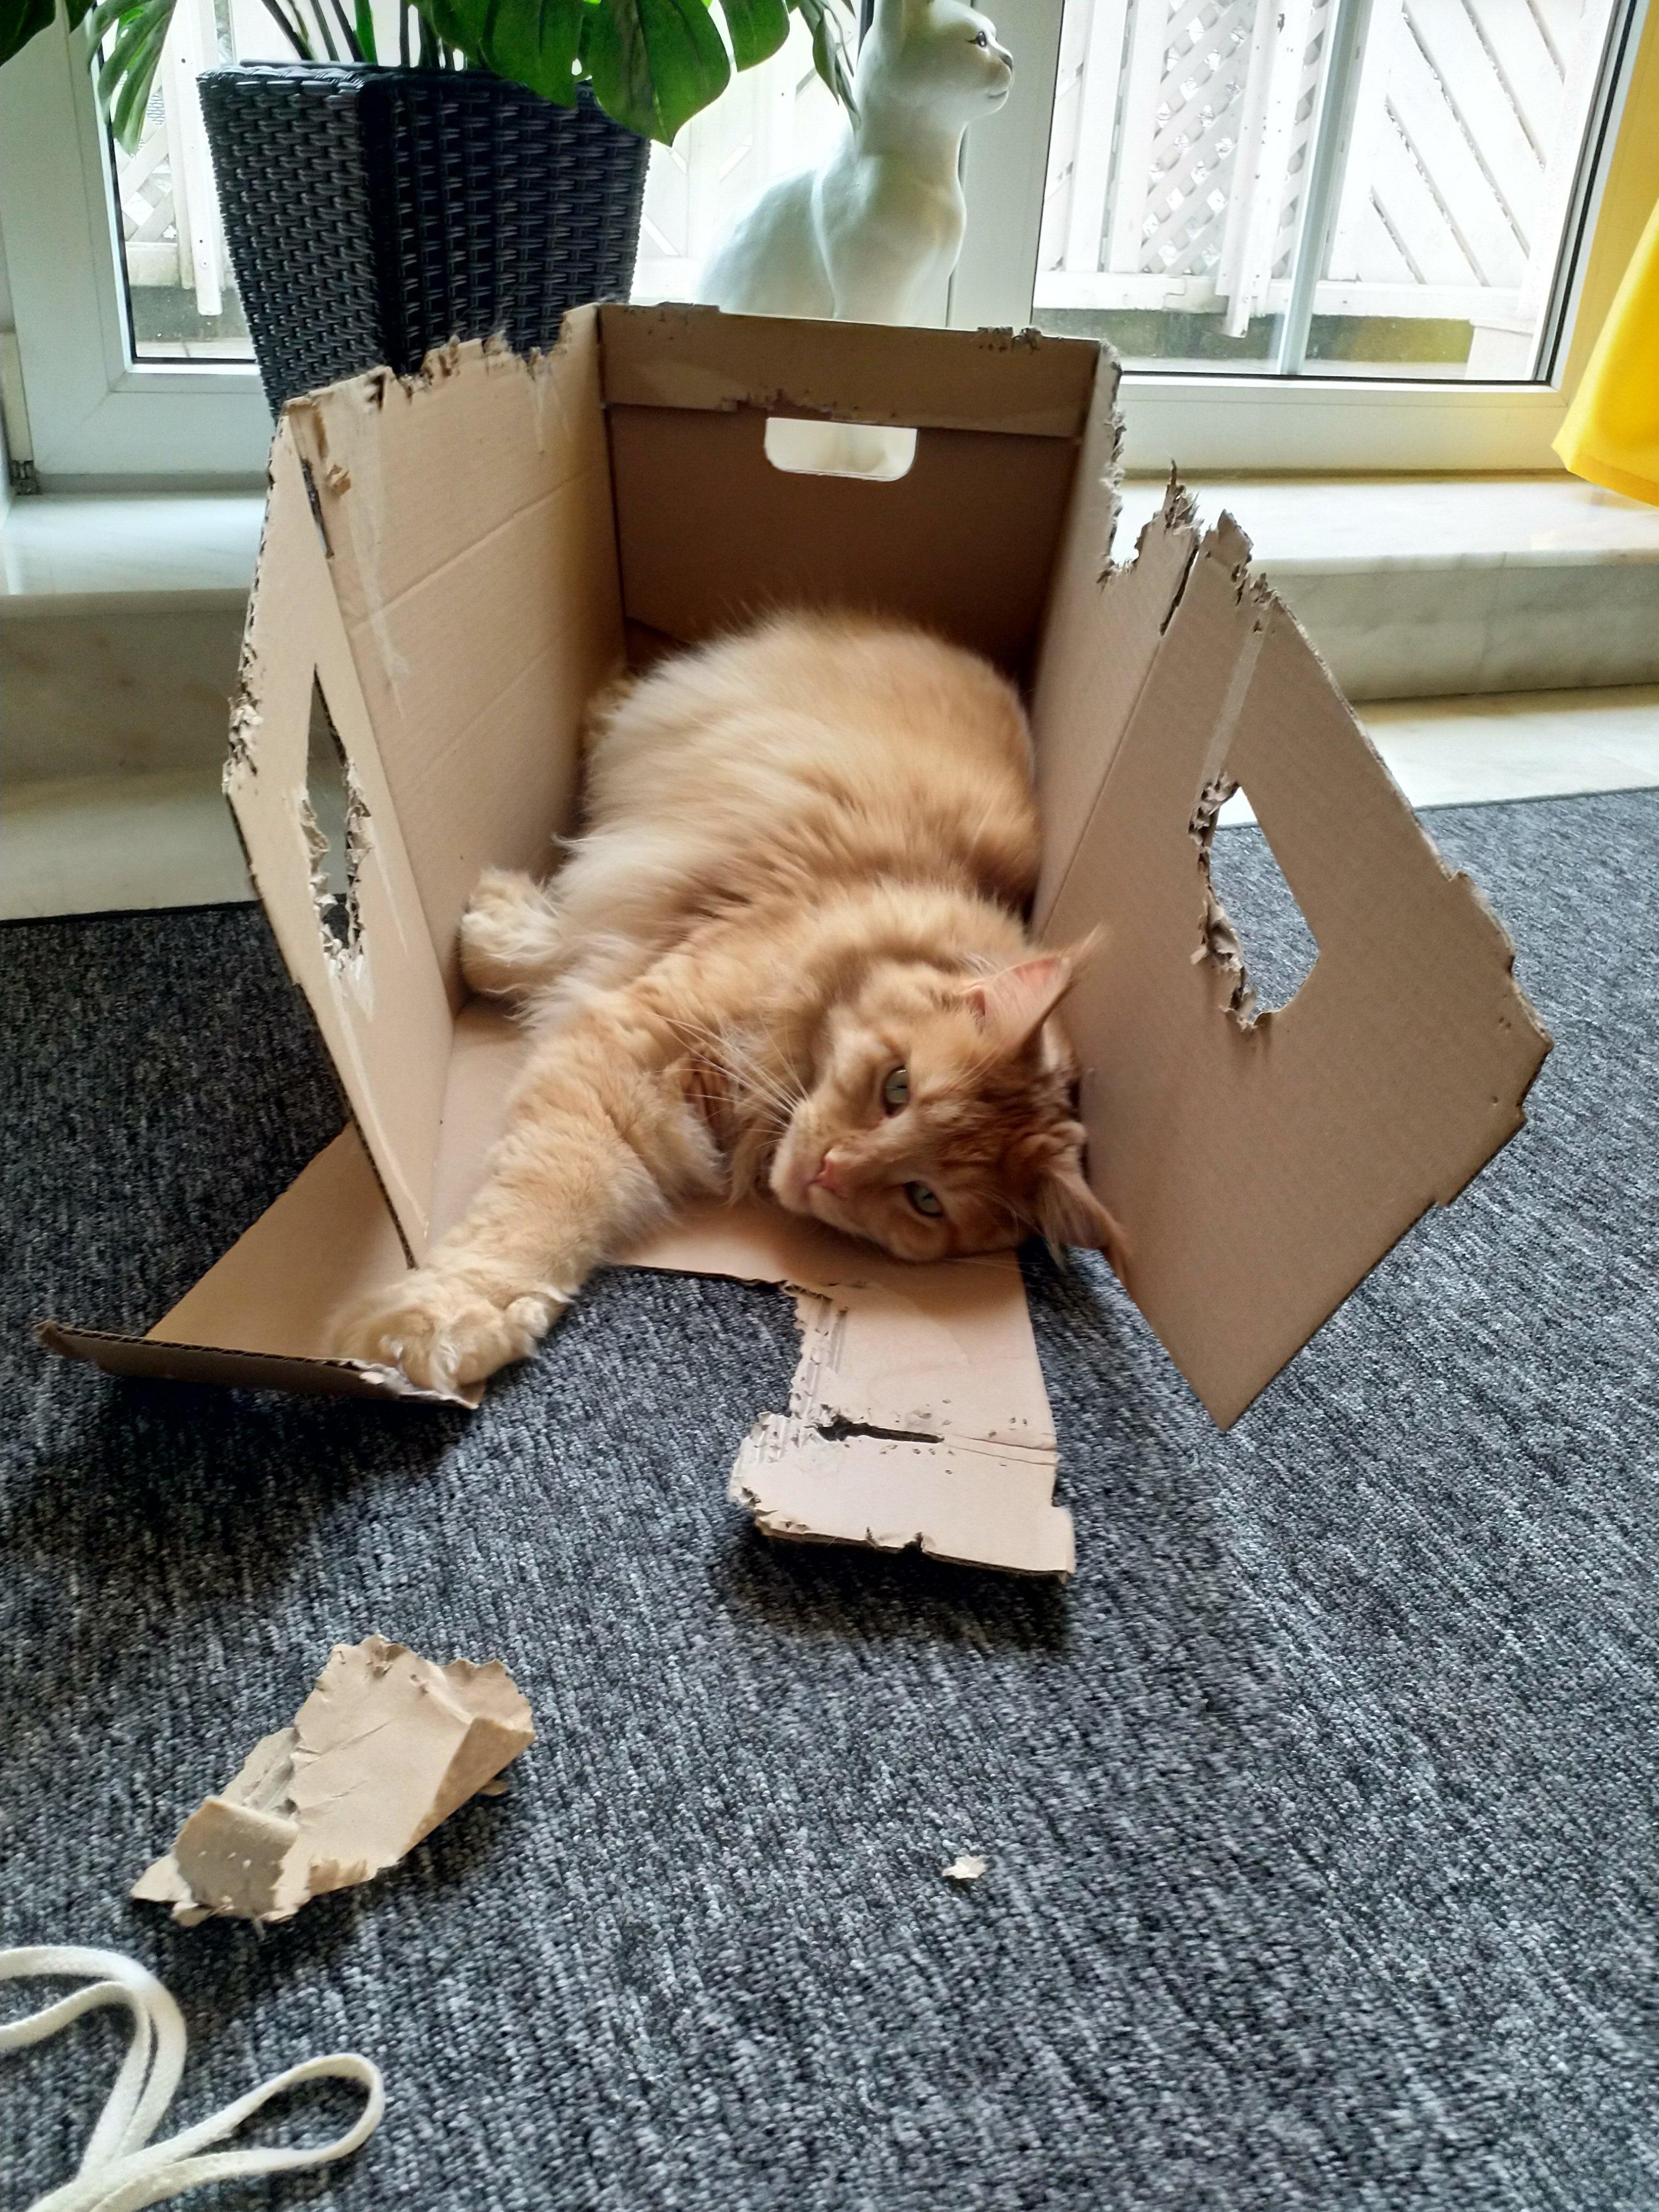 Sunny in der Kiste